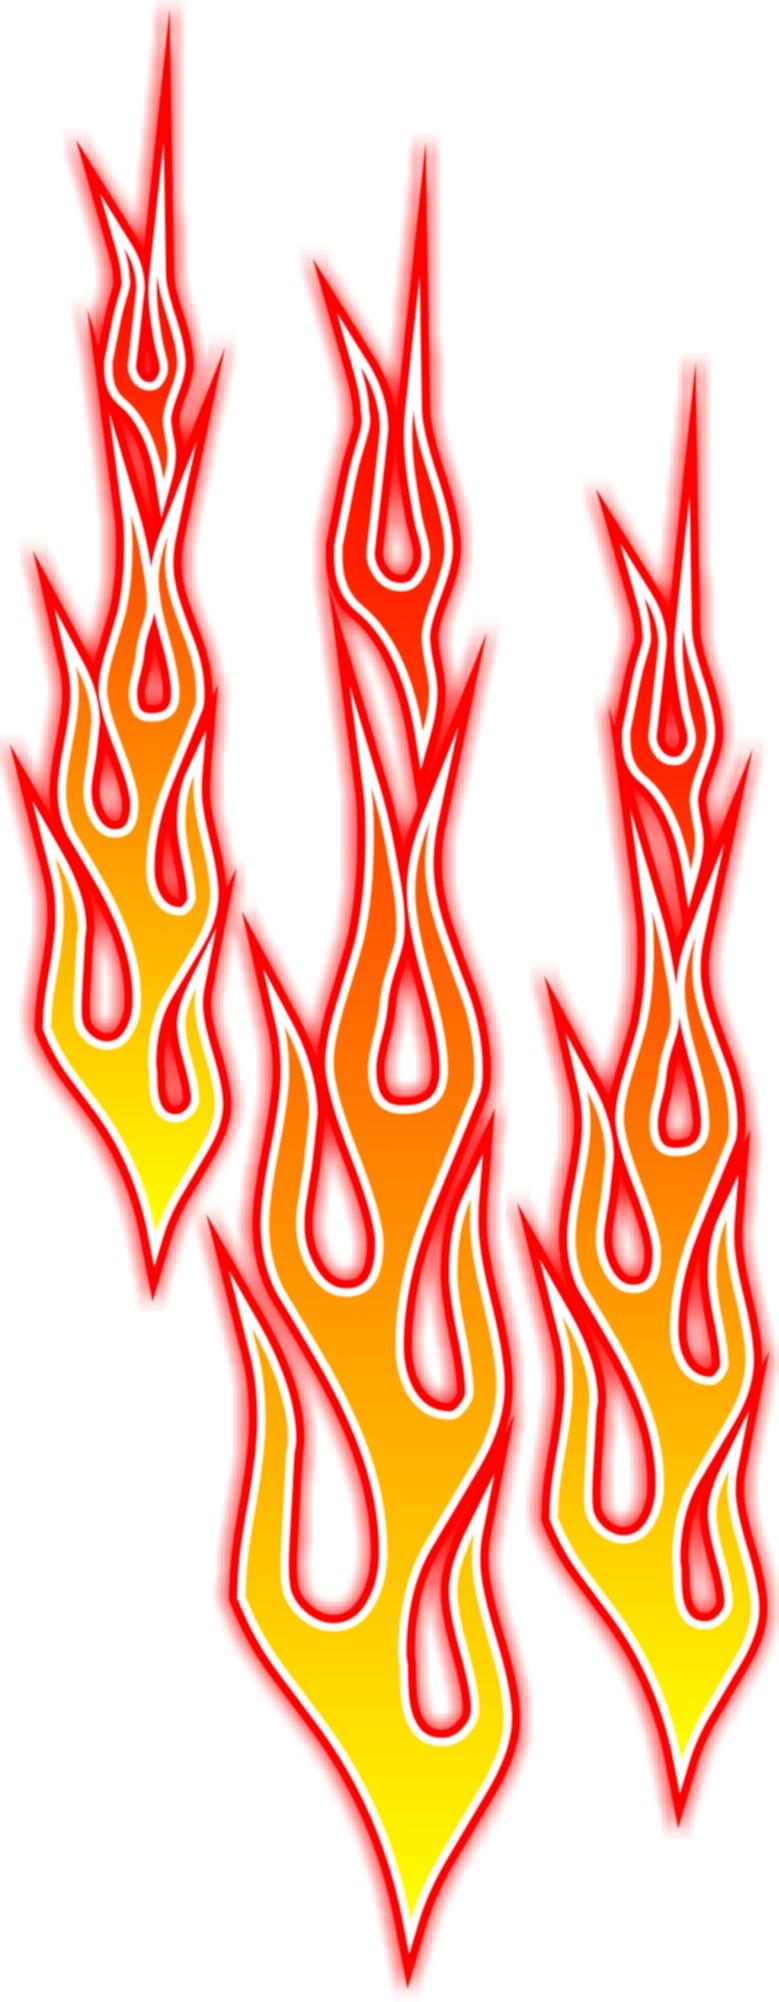 Fire Border Clip Art Fire 3 image vector clip art